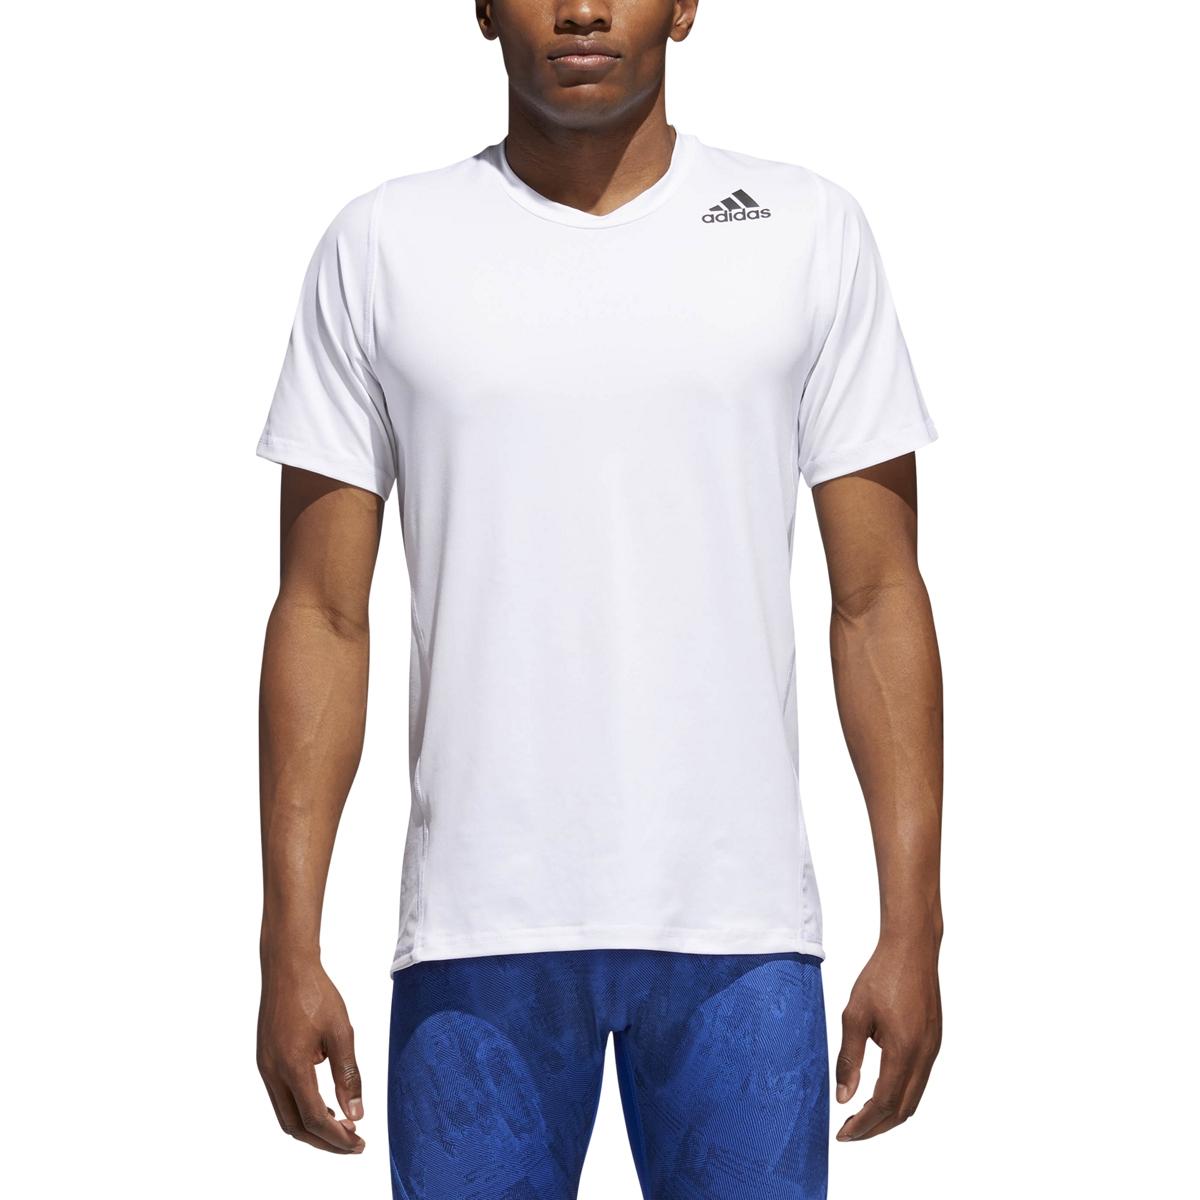 adidas Alphaskin Shortsleeve Tee T-Shirt Uomo